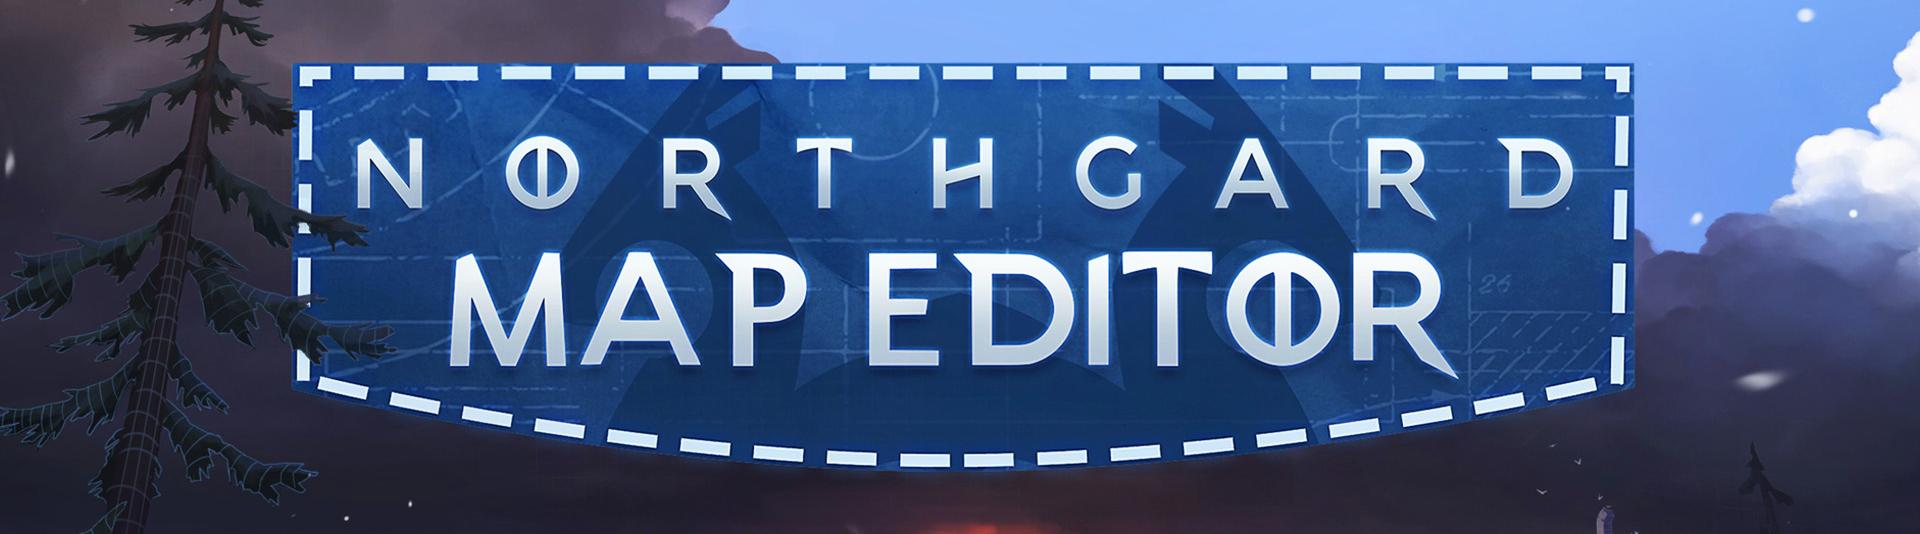 Northgard Map Editor